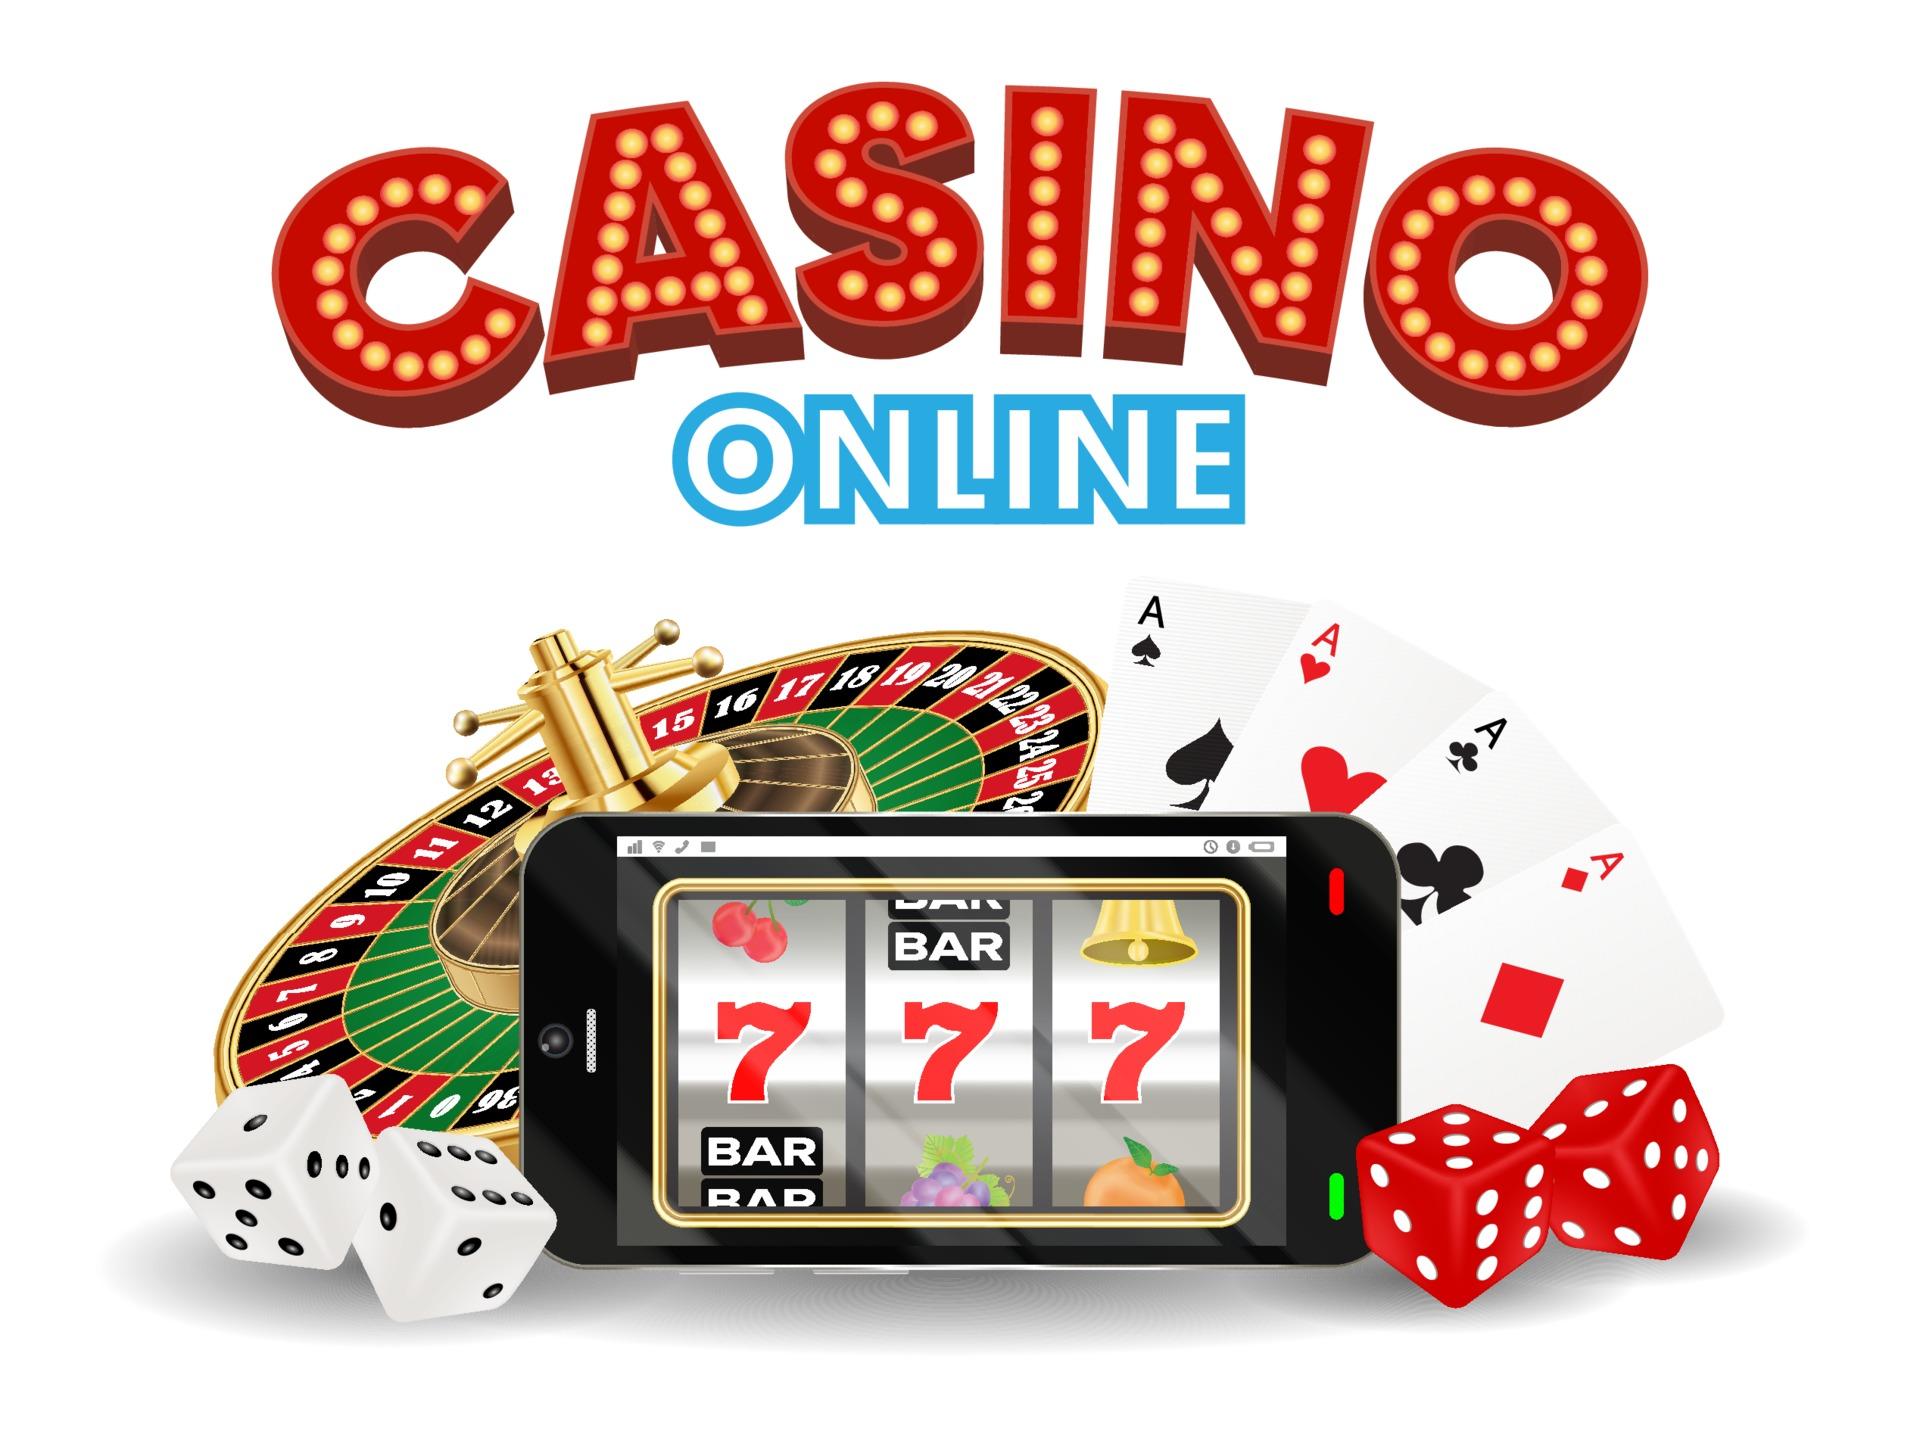 jeux casino en ligne belge